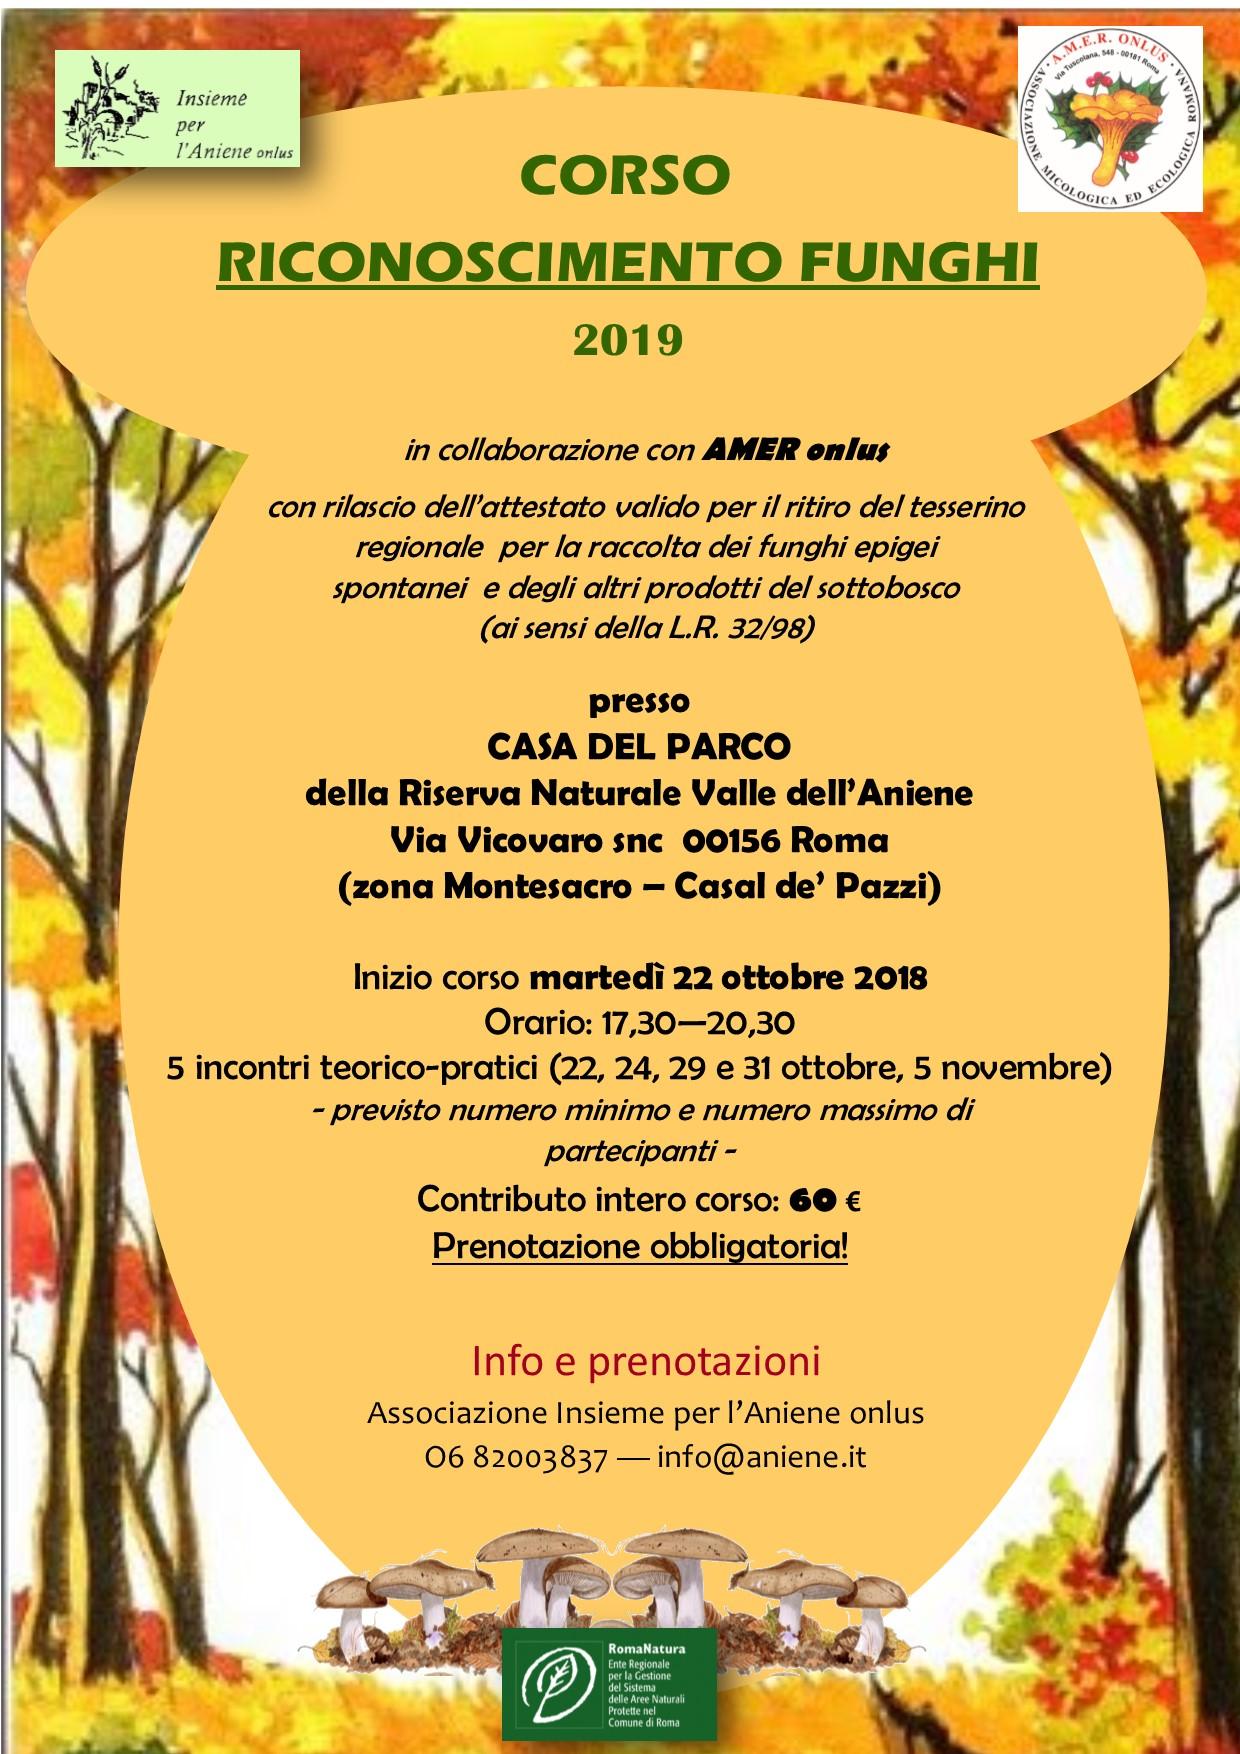 CORSO RICONOSCIMENTO FUNGHI 2019